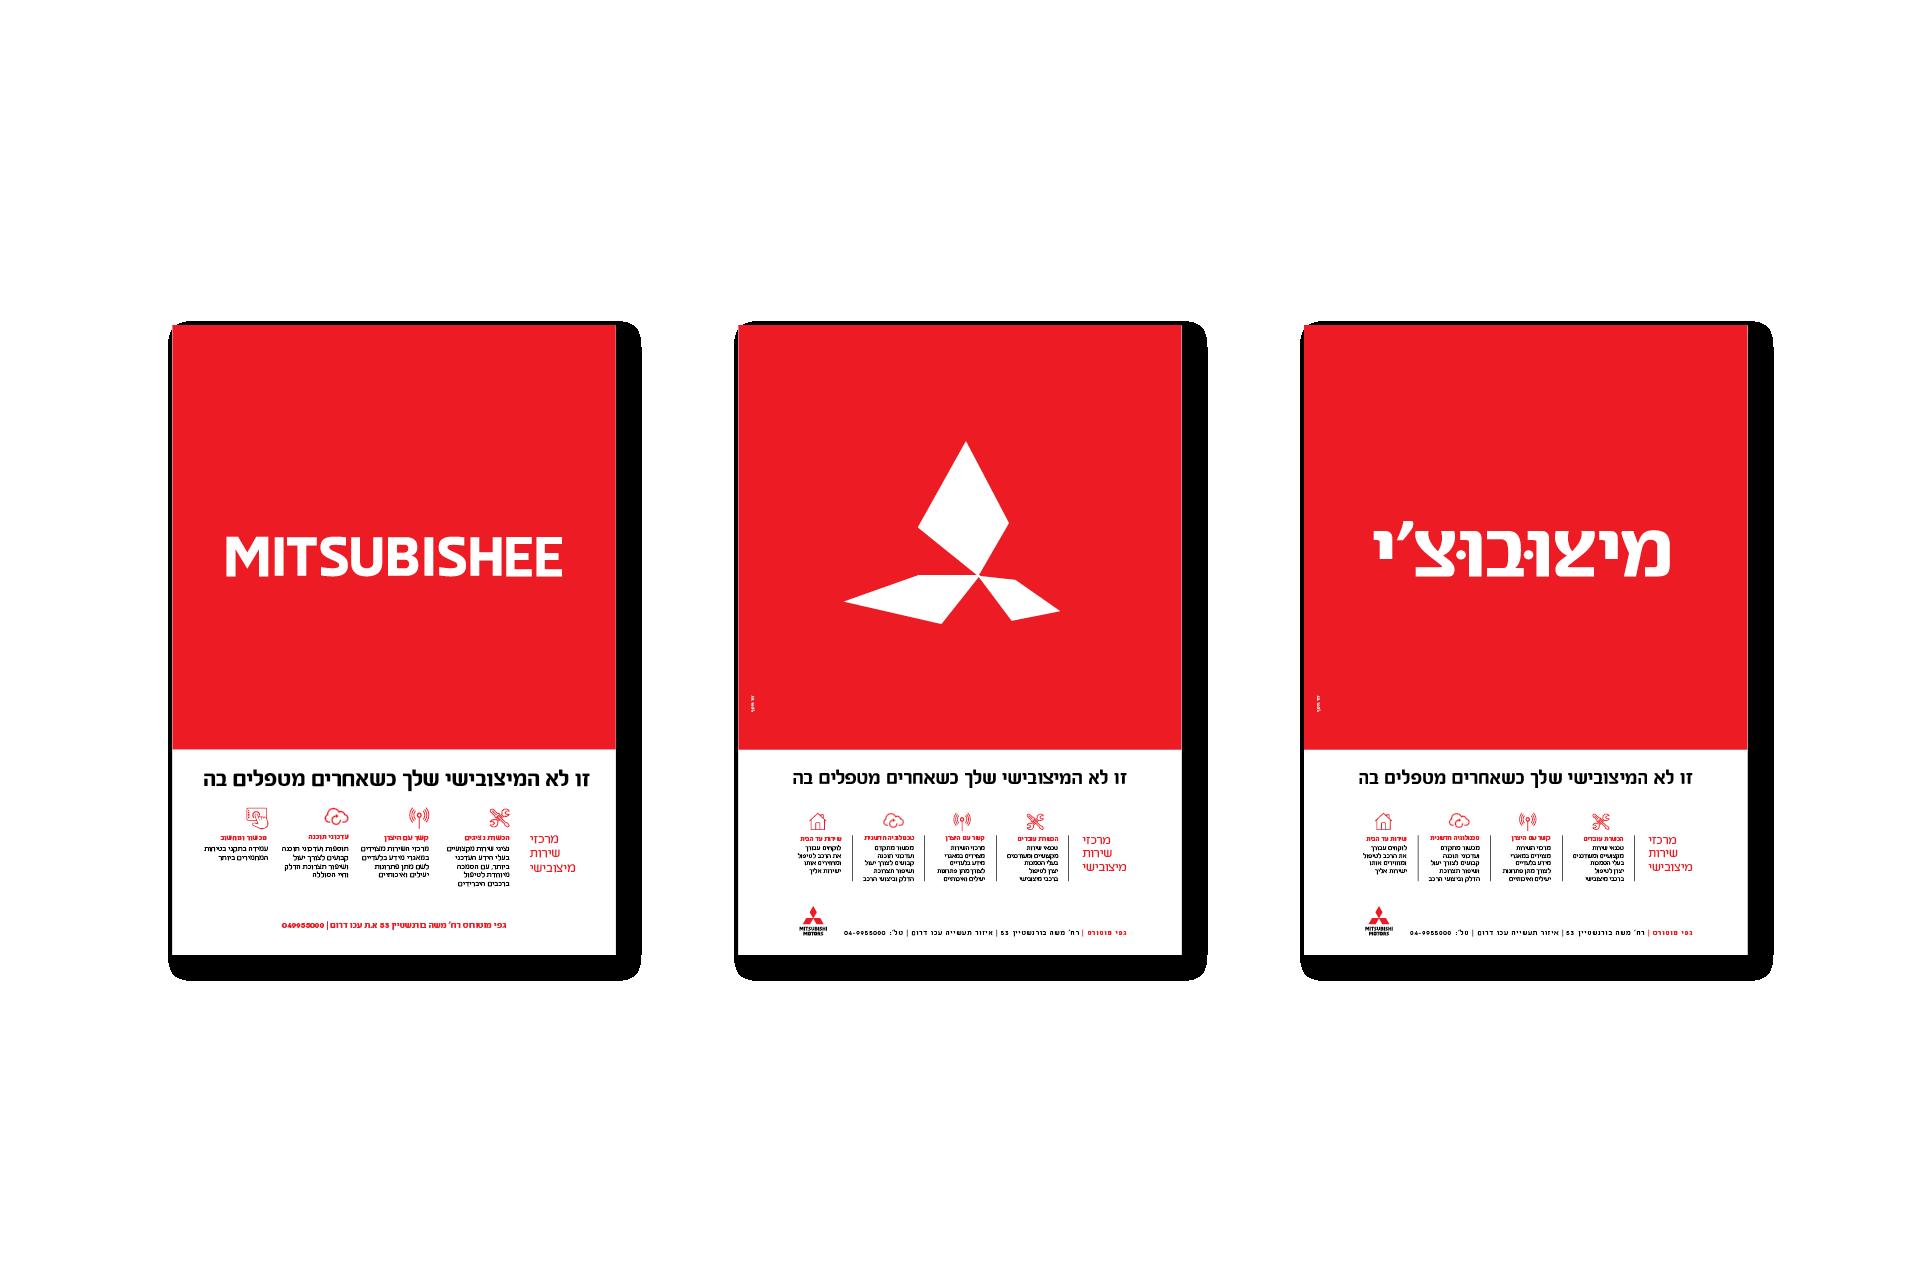 Mitsubishi campaign posters